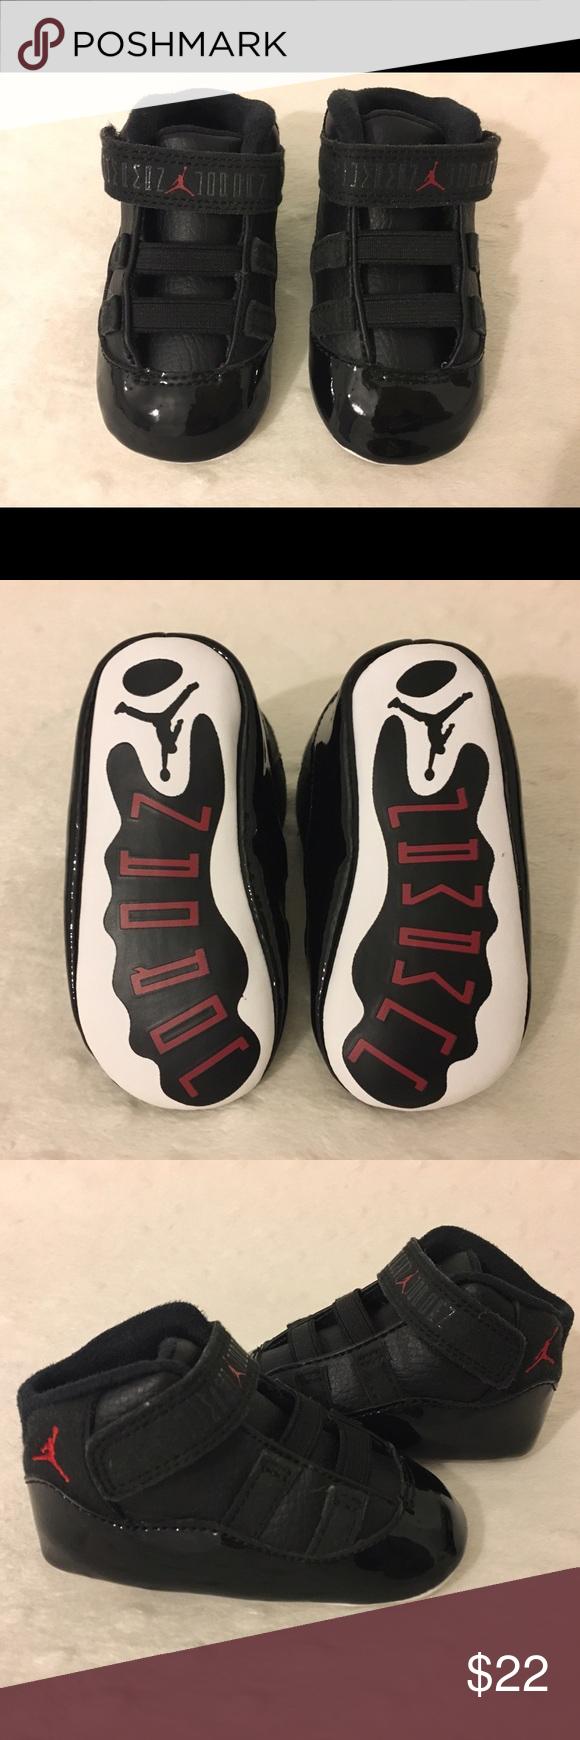 the latest bc2f2 b4bc9 Jordan 11 Retro Soft Bottom Infant Crib Sneakers Brand New ...